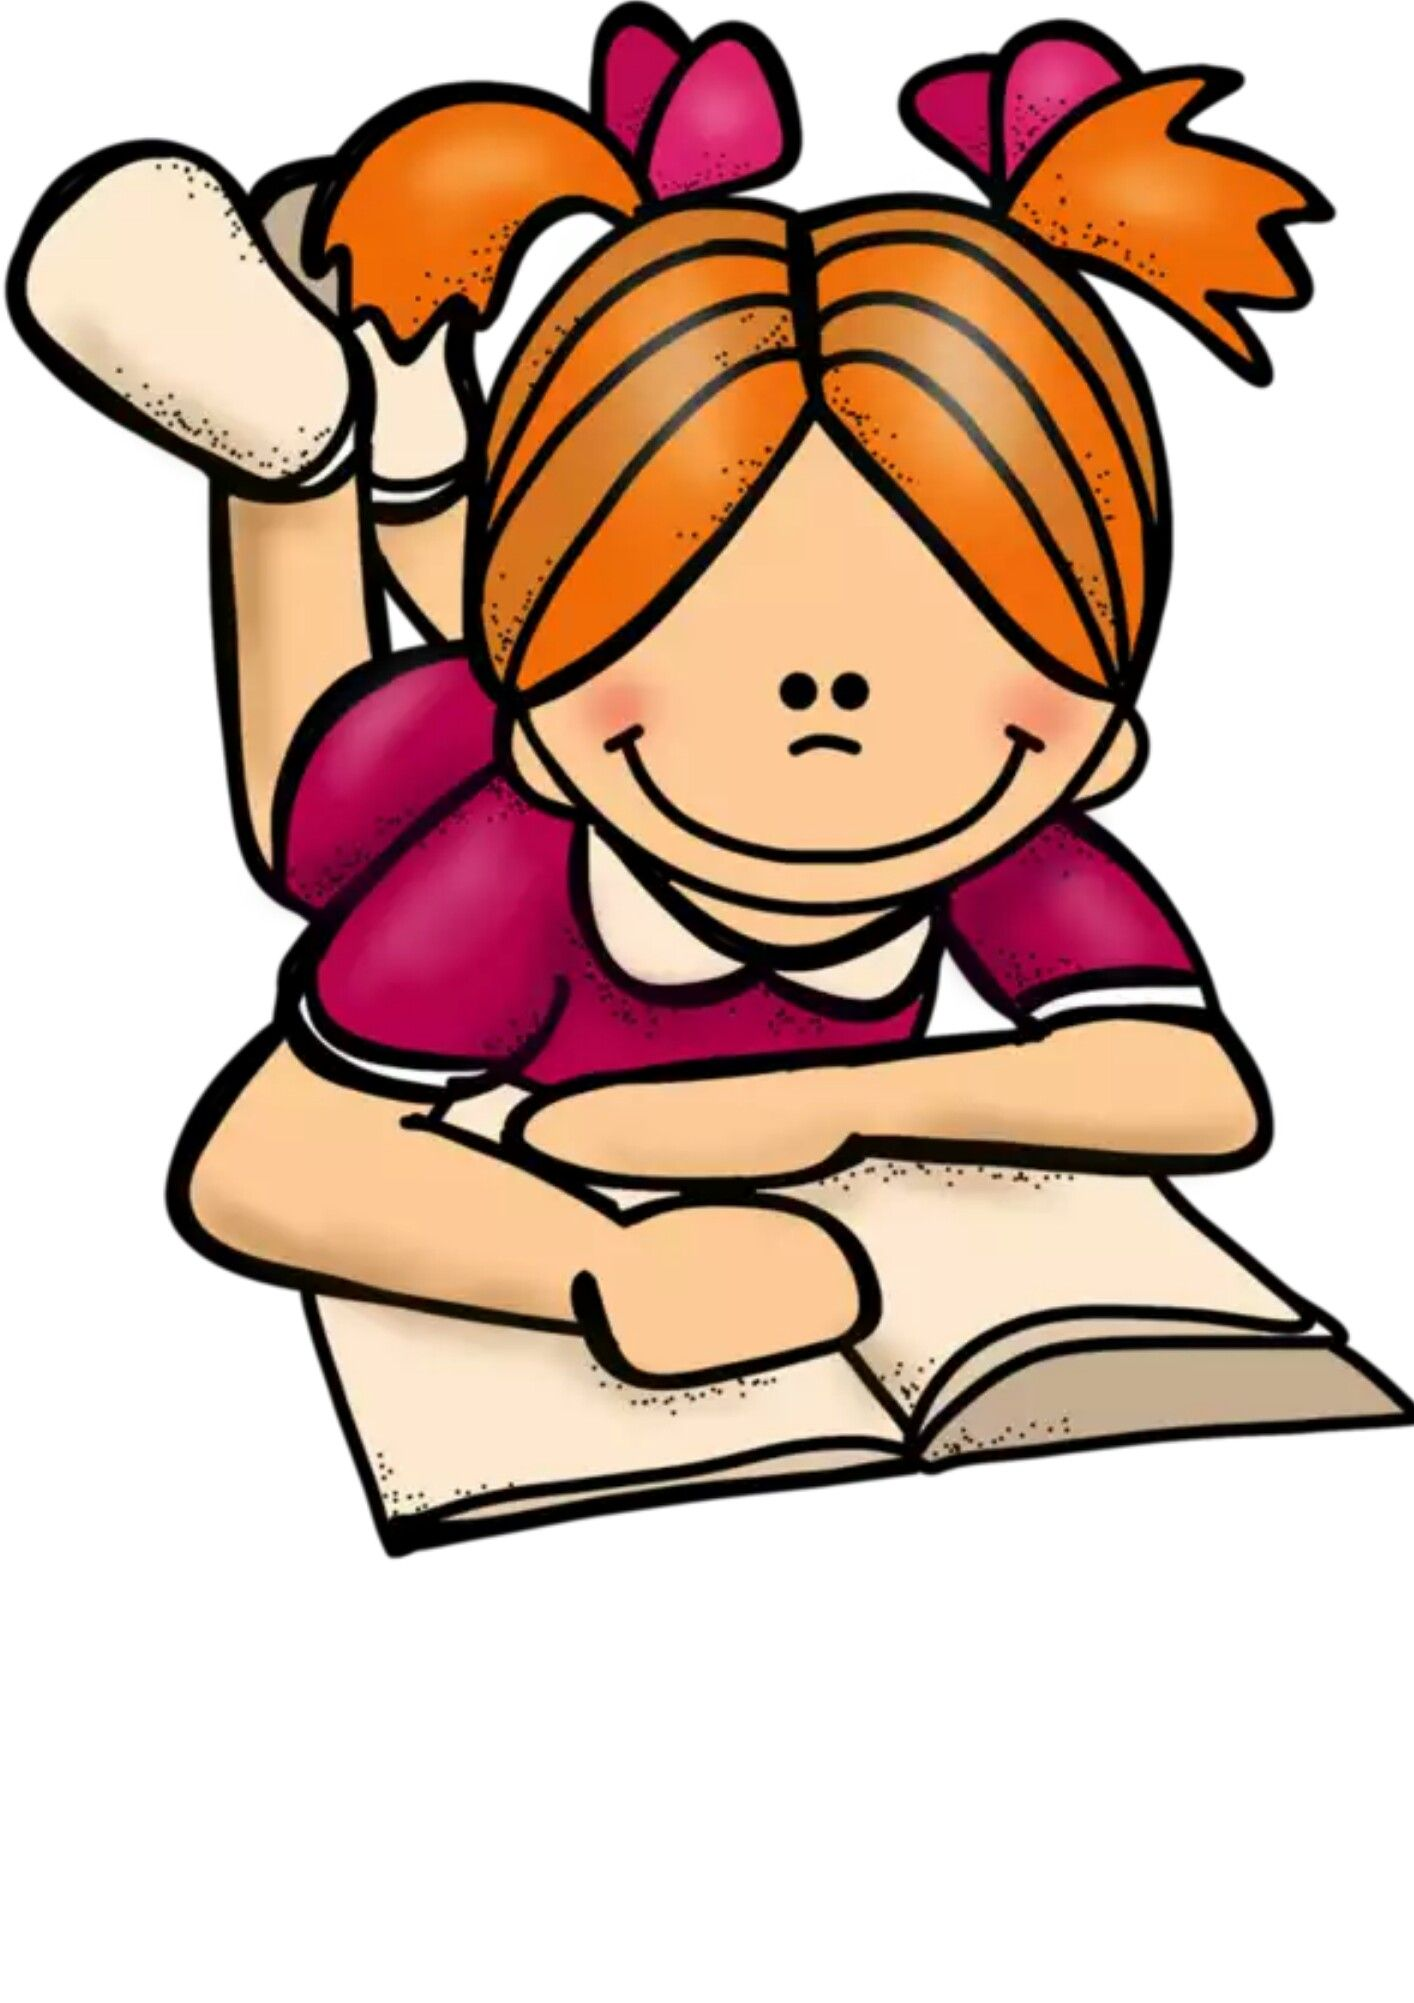 Reading #melonheadz.